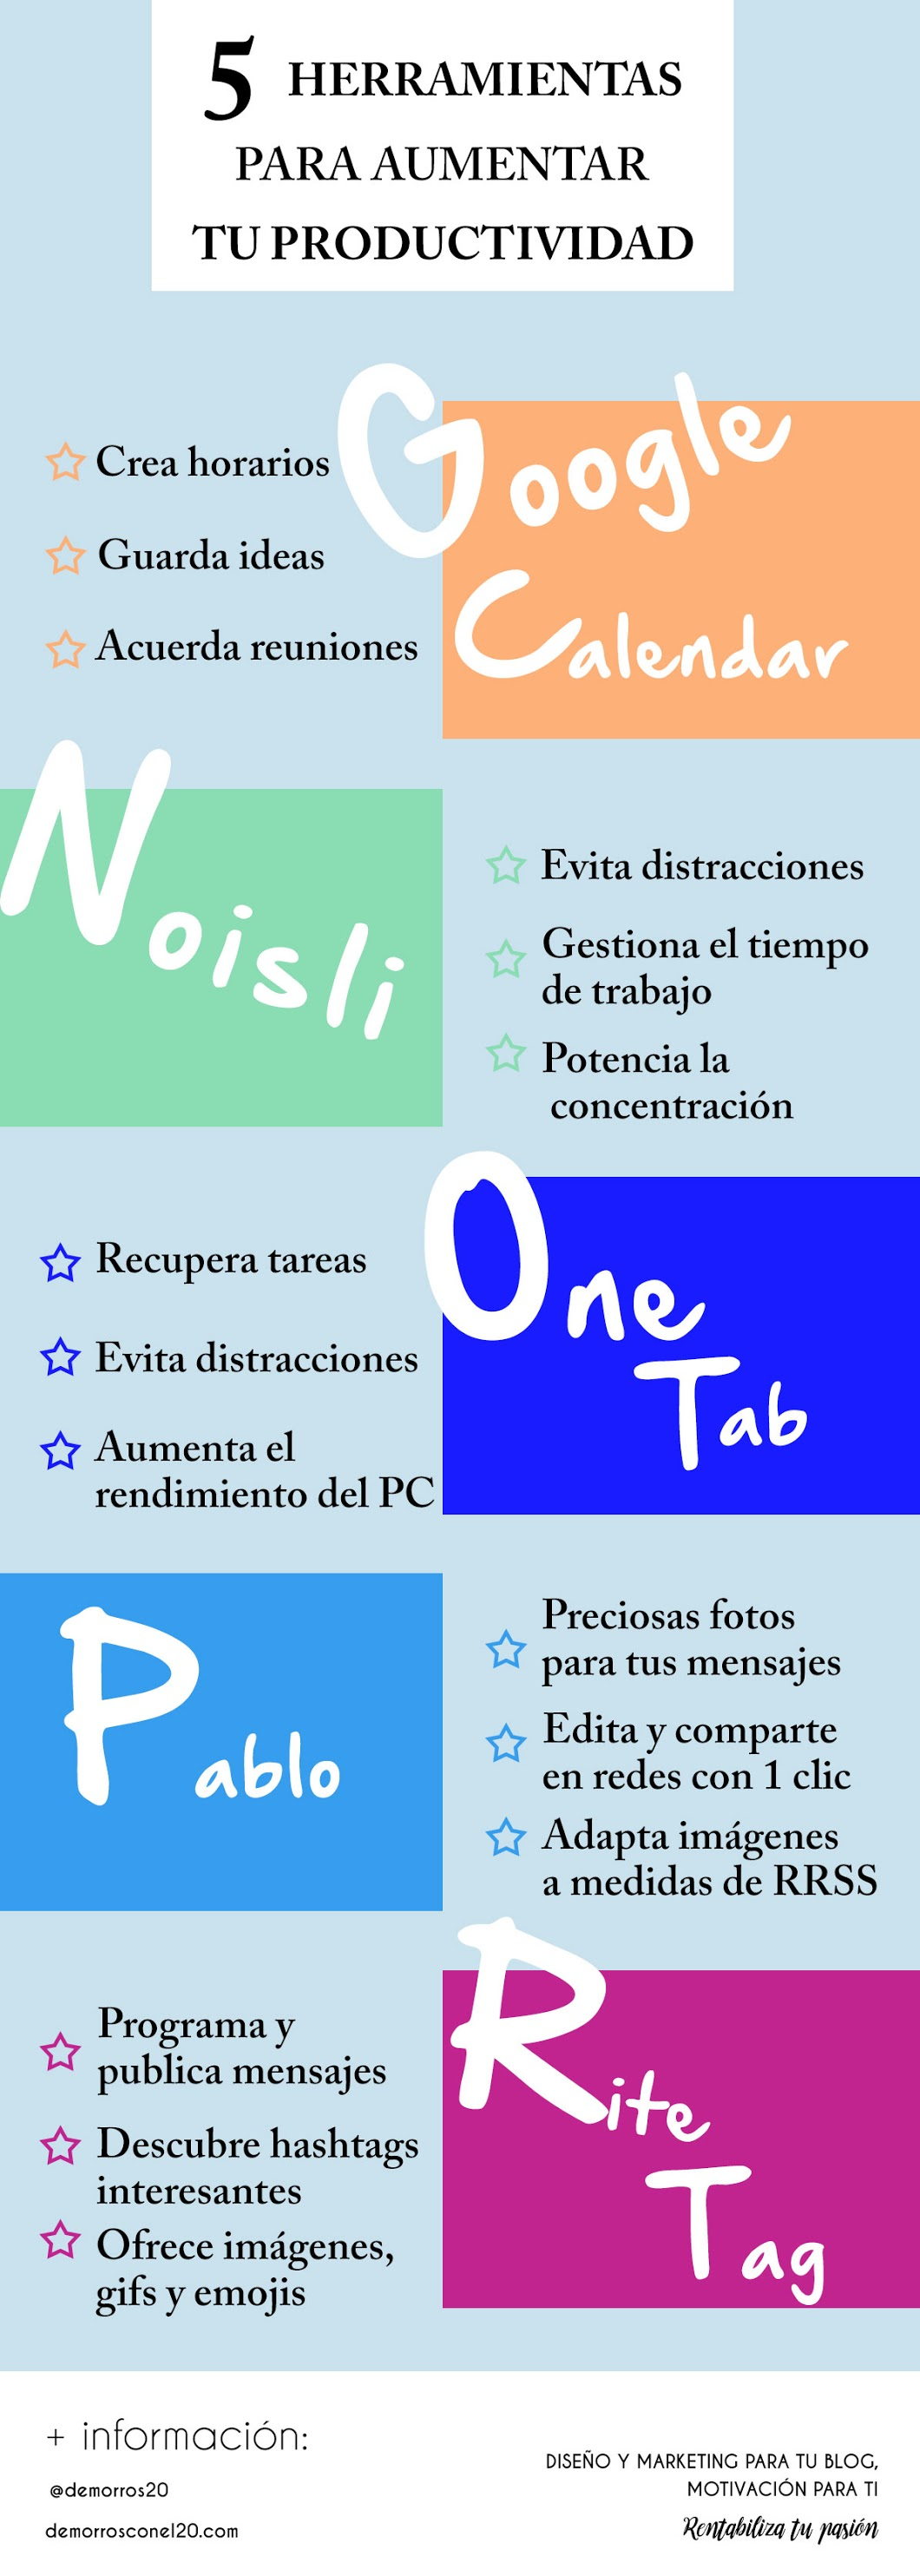 infografia-5-herramientas-para-aumentar-productividad